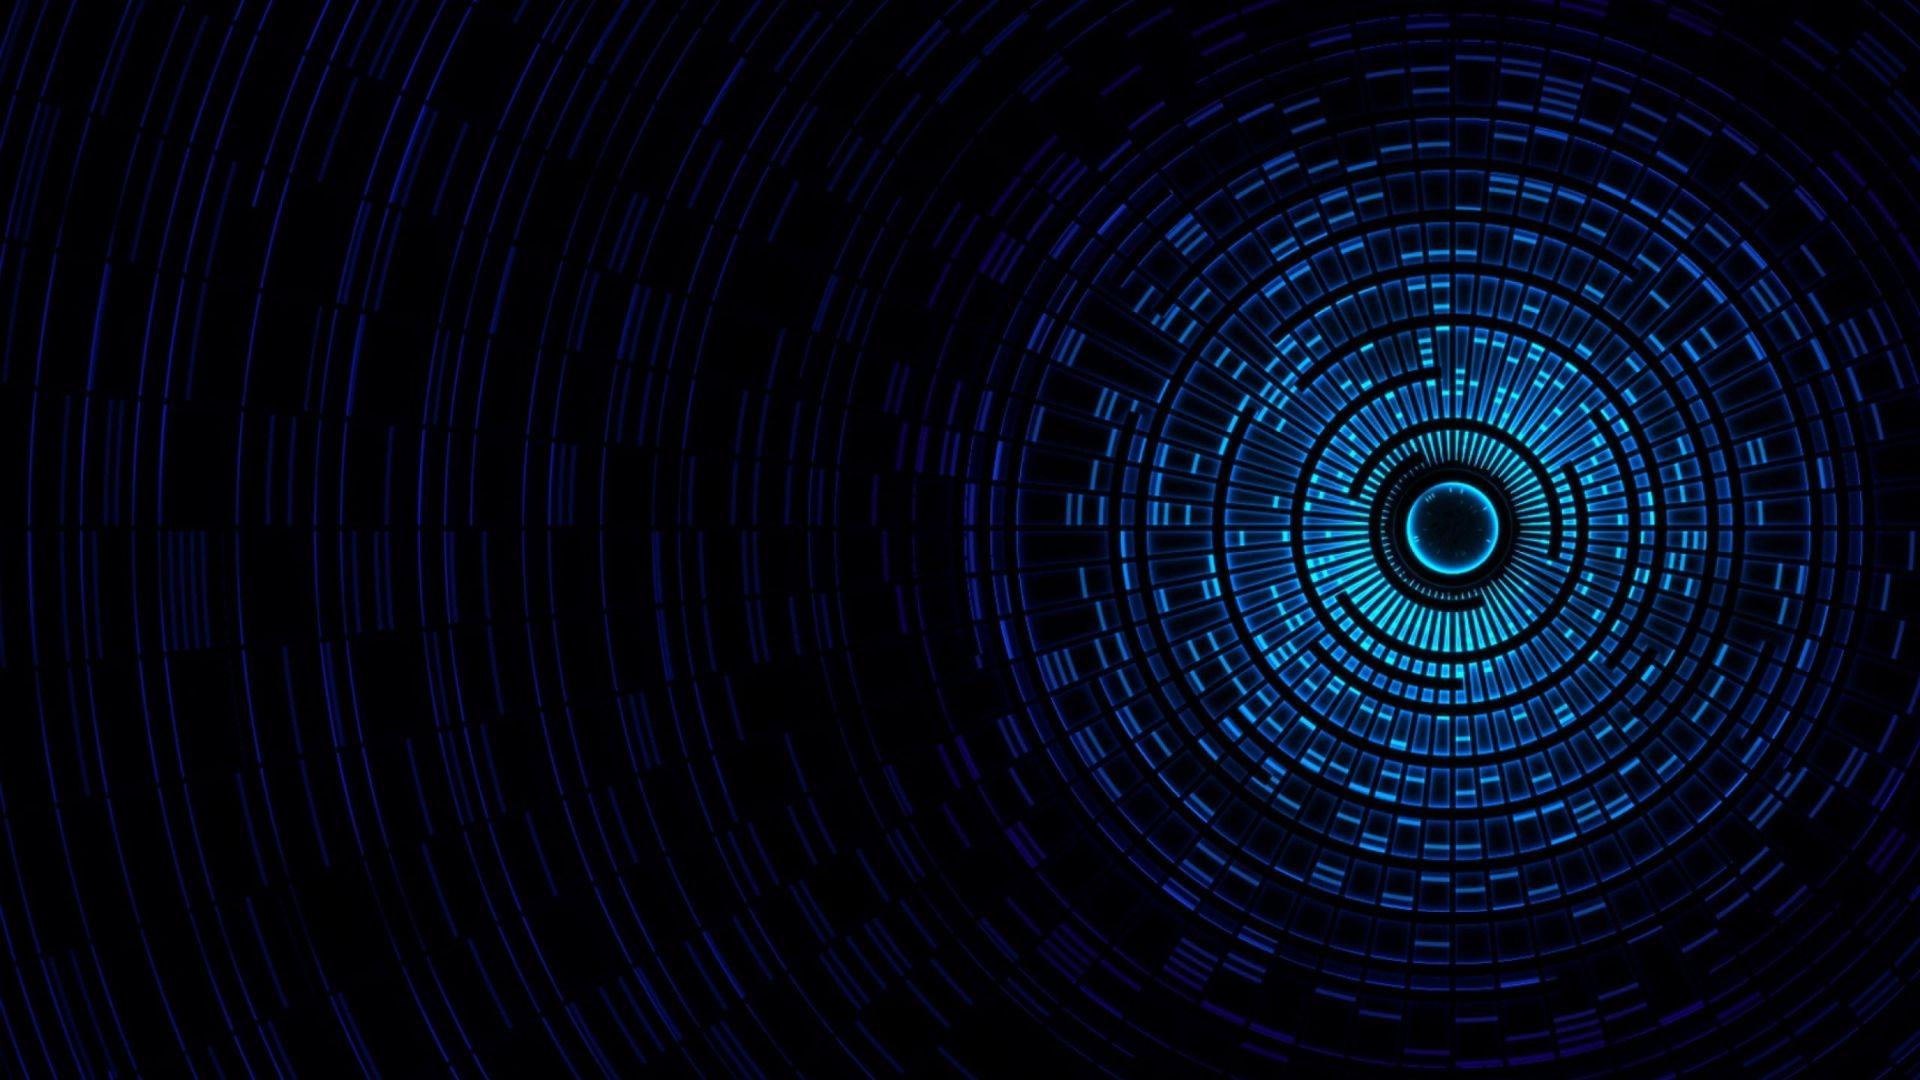 1920x1080px Free Download Hd Wallpaper Blue Tunnel Digital Wallpaper Abstract Digital Blasph Dark Blue Wallpaper Background Hd Wallpaper Blue Wallpapers